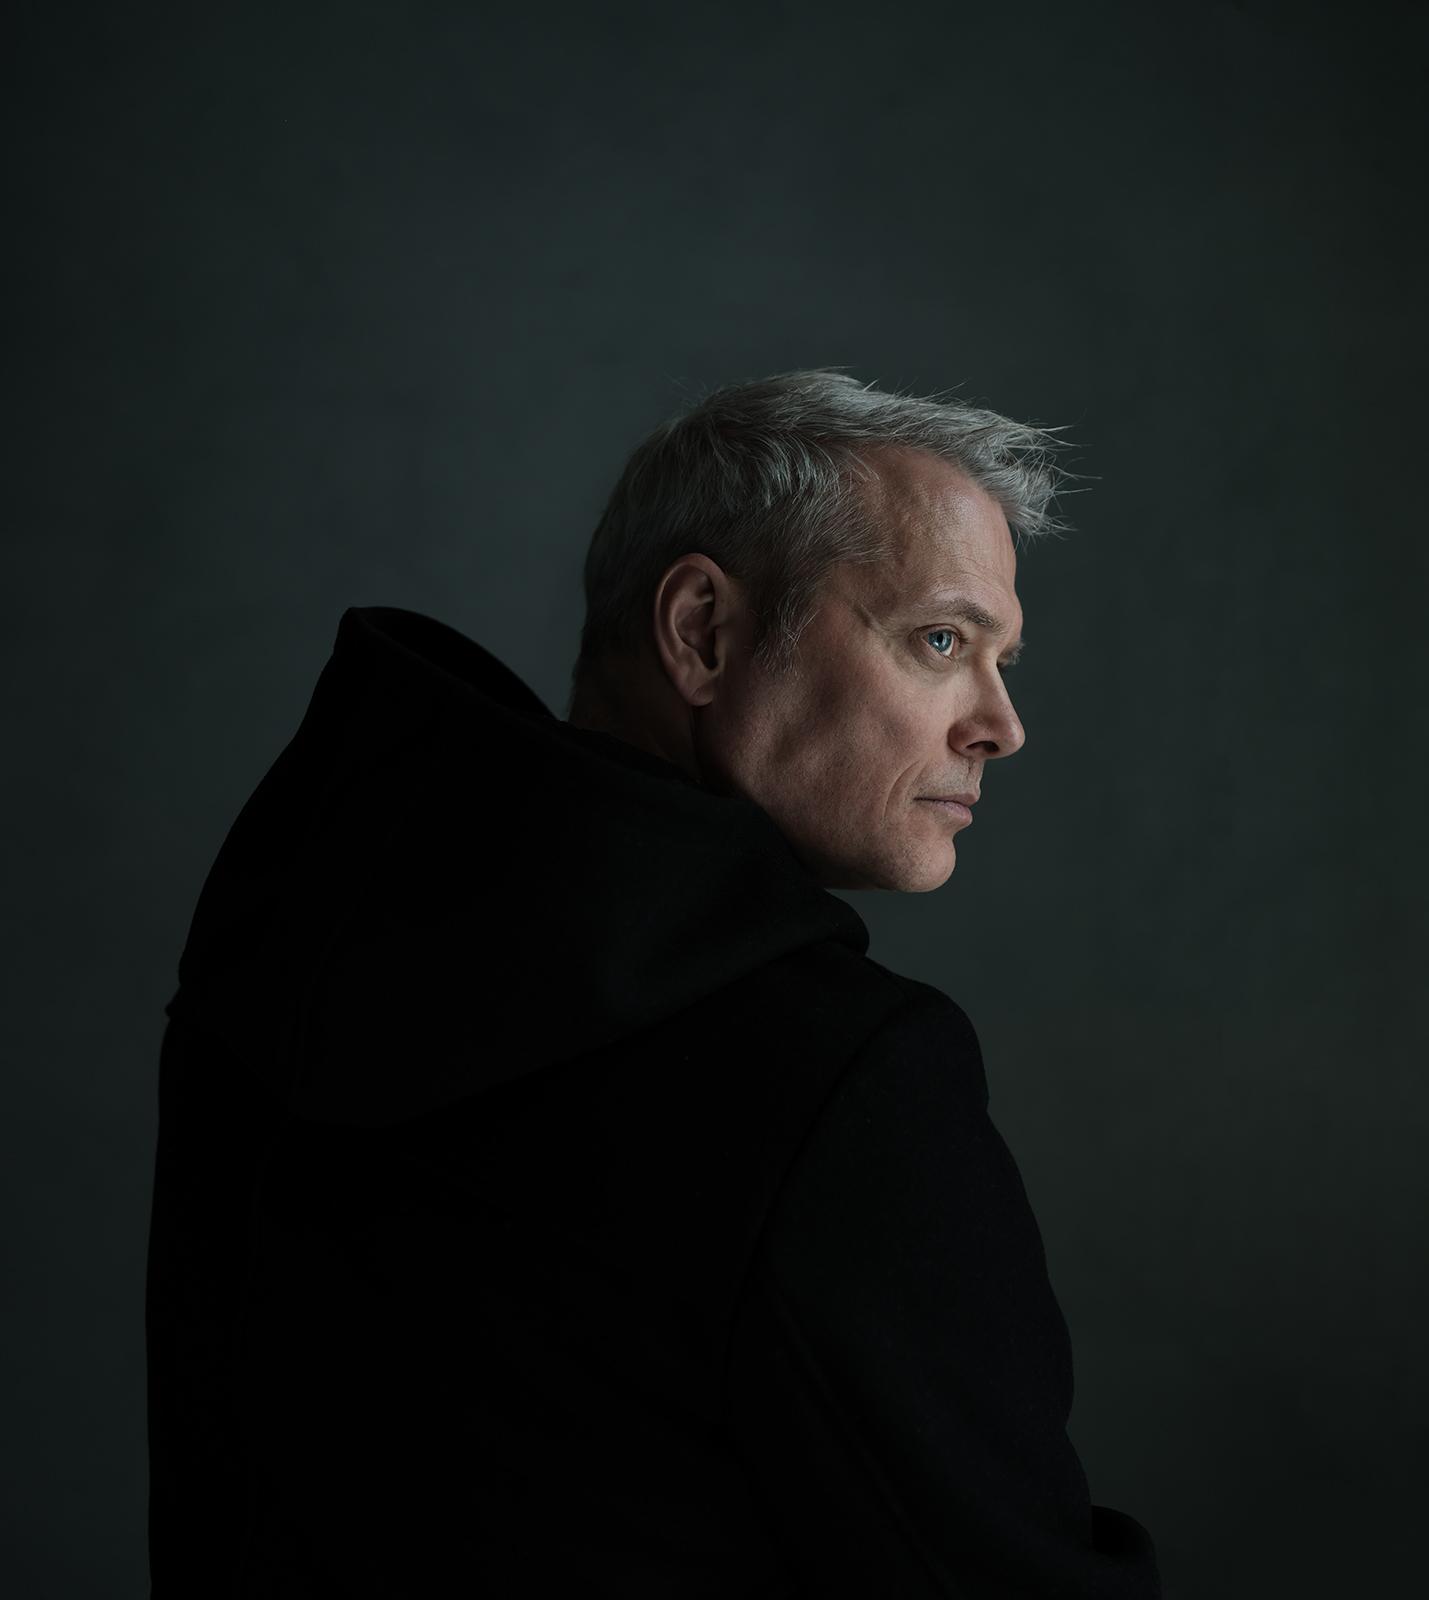 portret, portrait, portretfotografie, portraitfotgrafie, acteur, actor, Susanne Middelberg